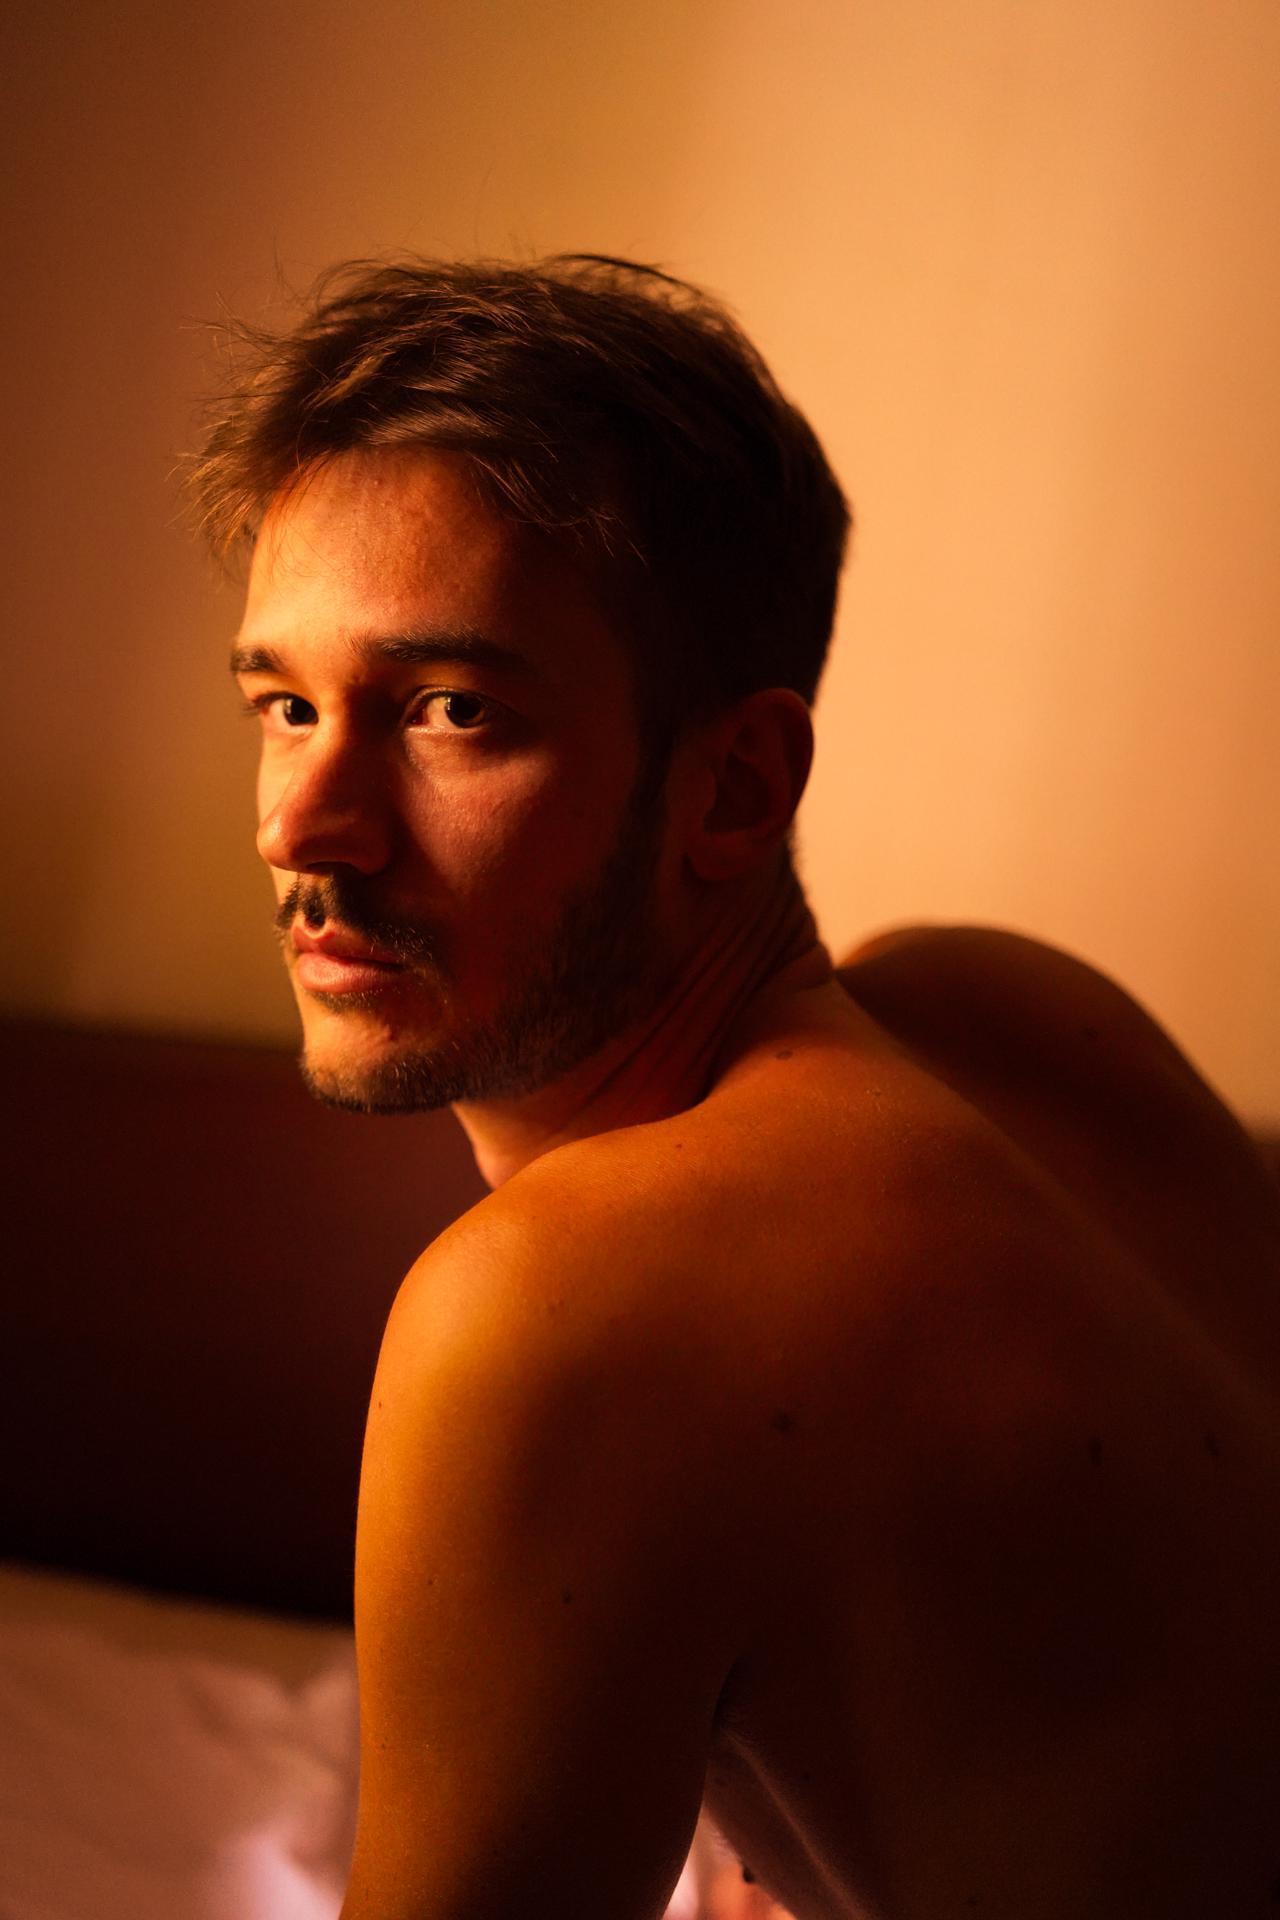 Lorenzo from Italy